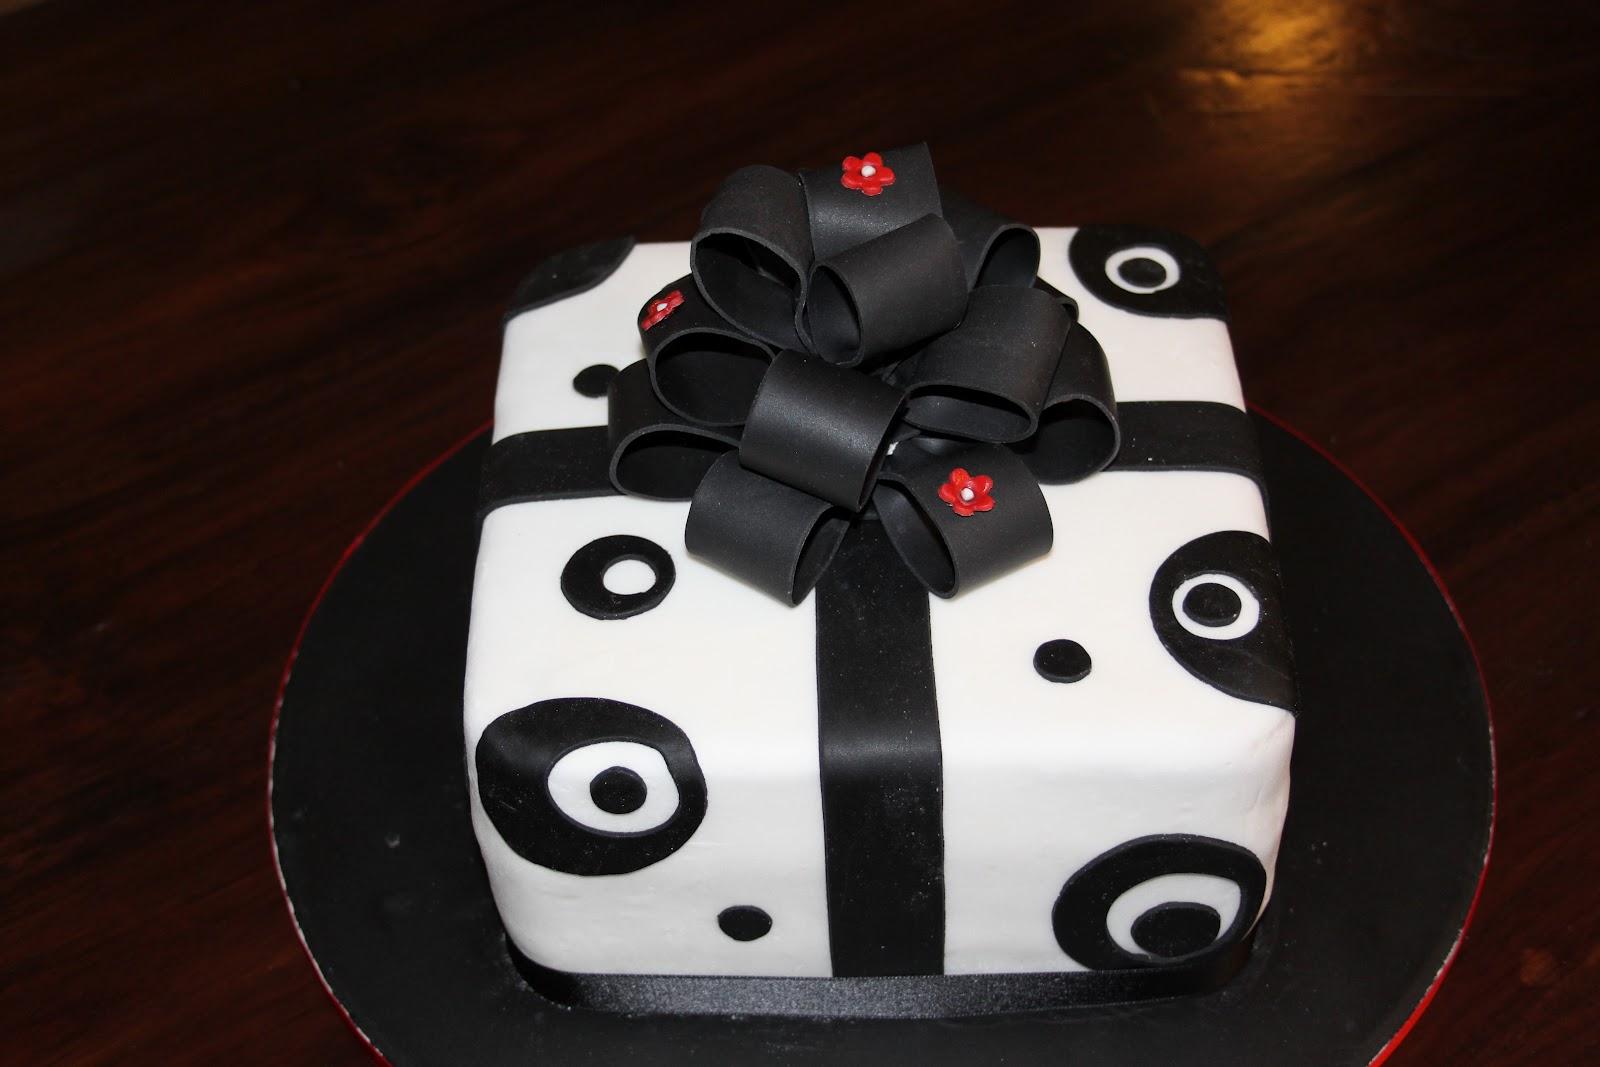 Su boss de sas turtas black white cake for Aspirare significato